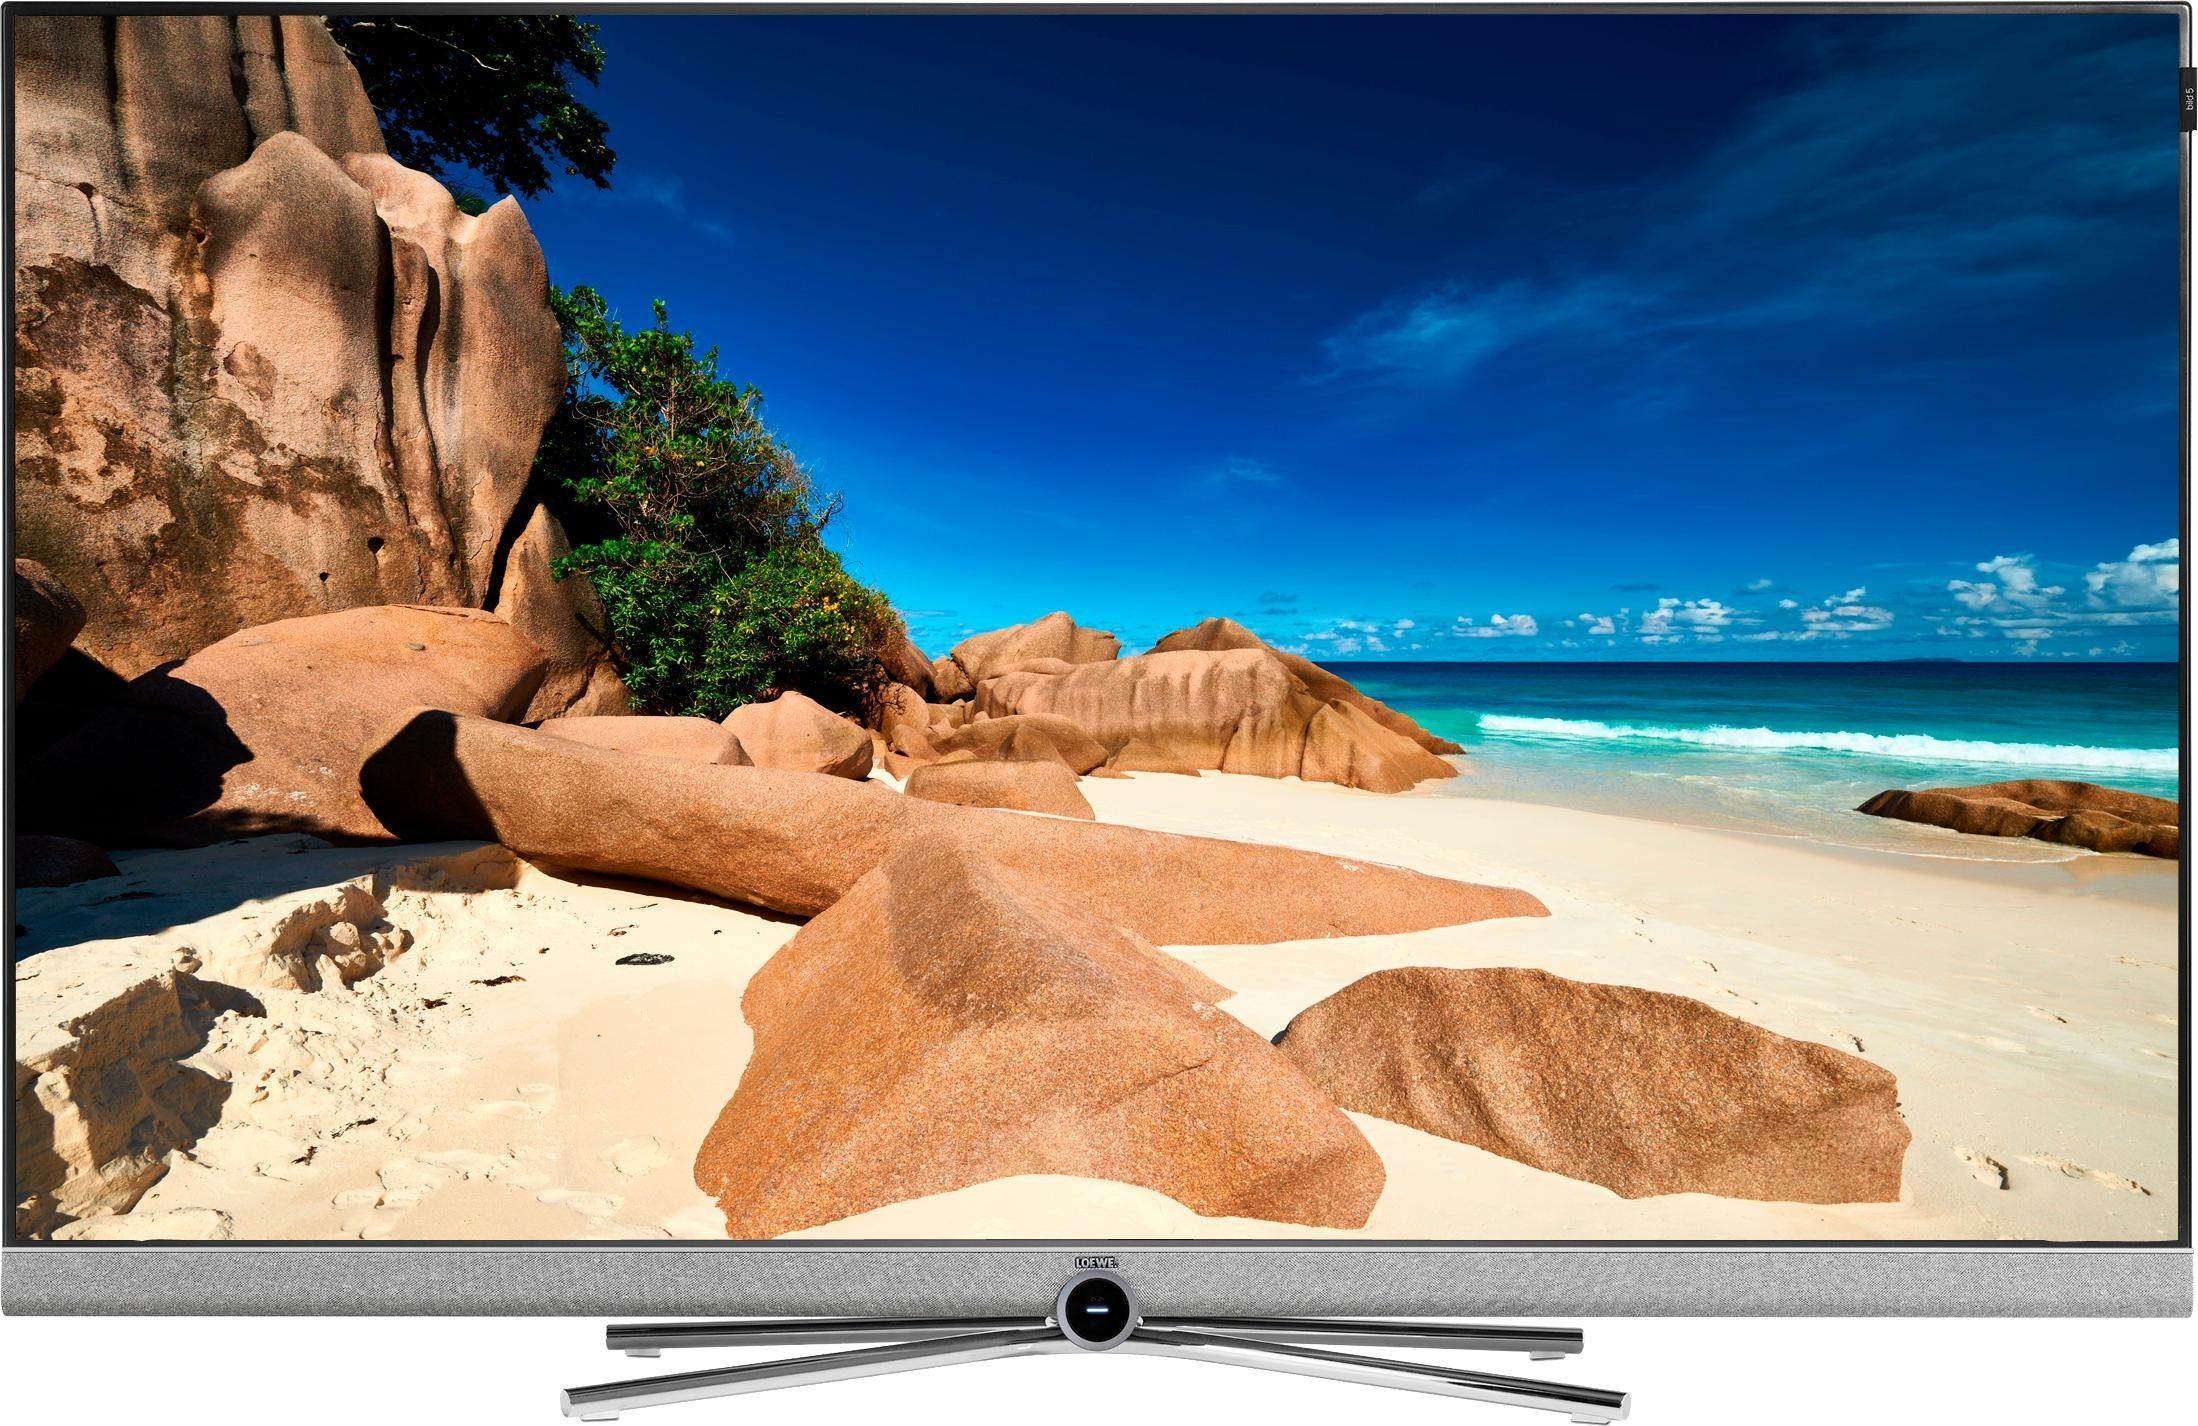 Loewe bild 5.48 LED-Fernseher (122 cm/48 Zoll, 4K Ultra HD, Smart-TV, USB Archive)